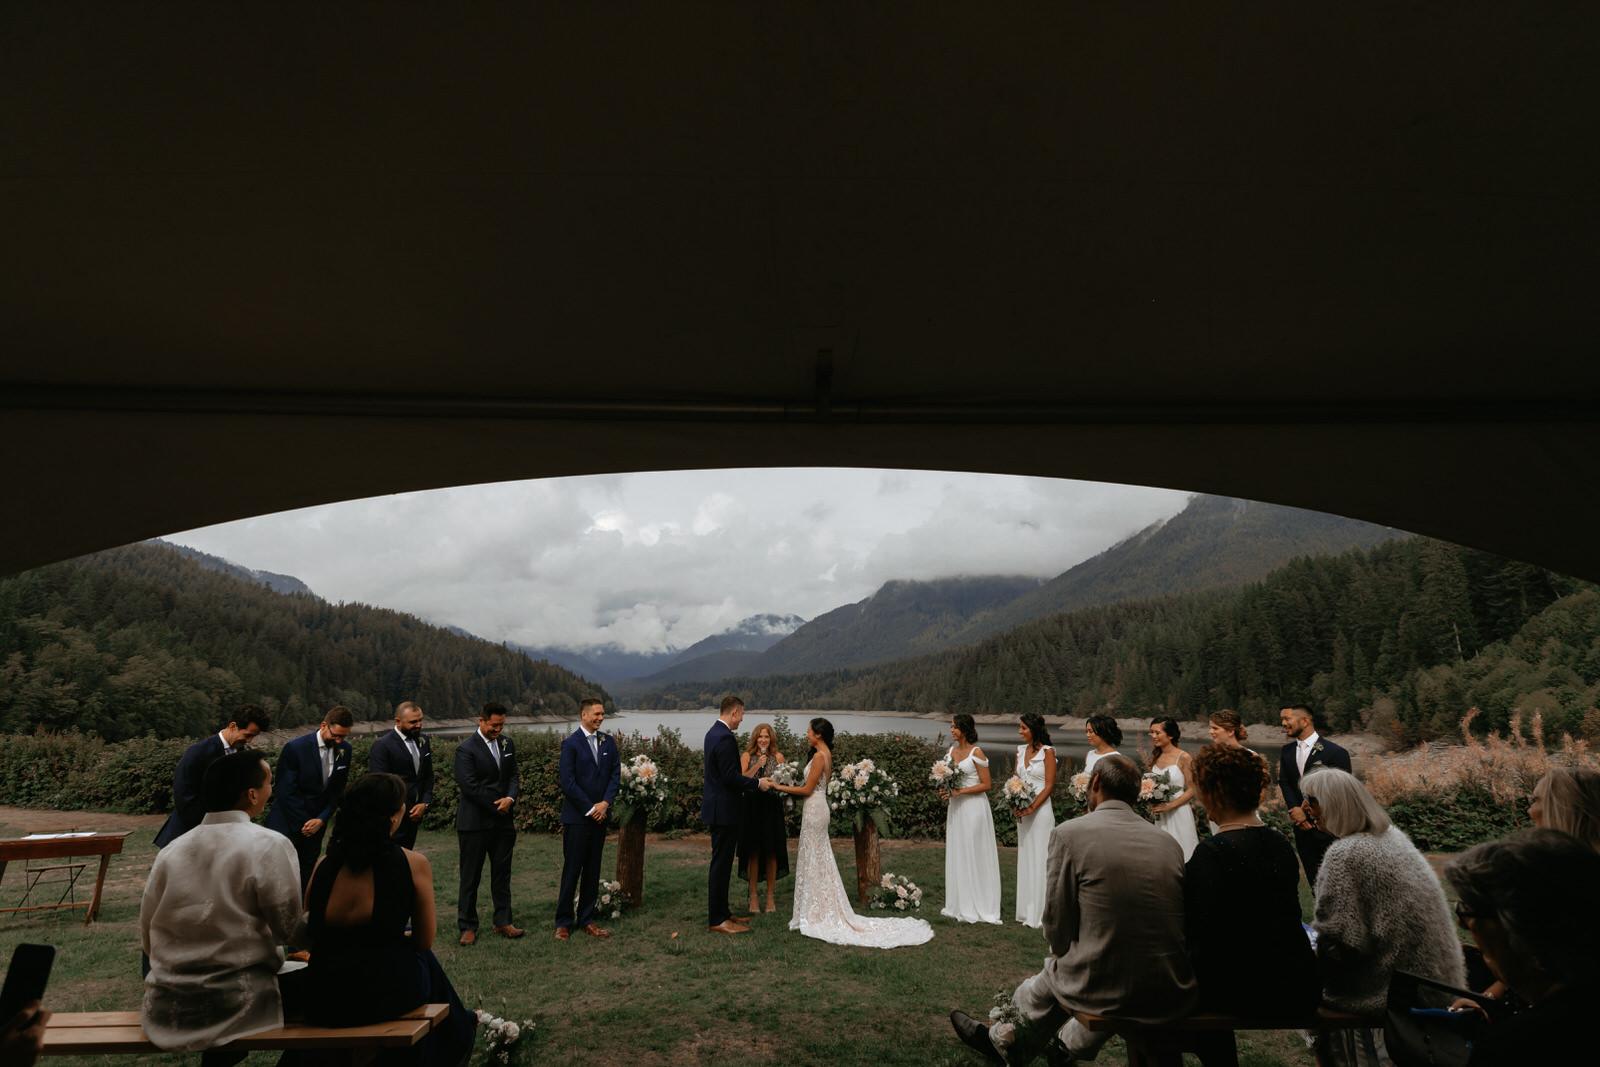 Cleveland-Park-wedding-5.jpg